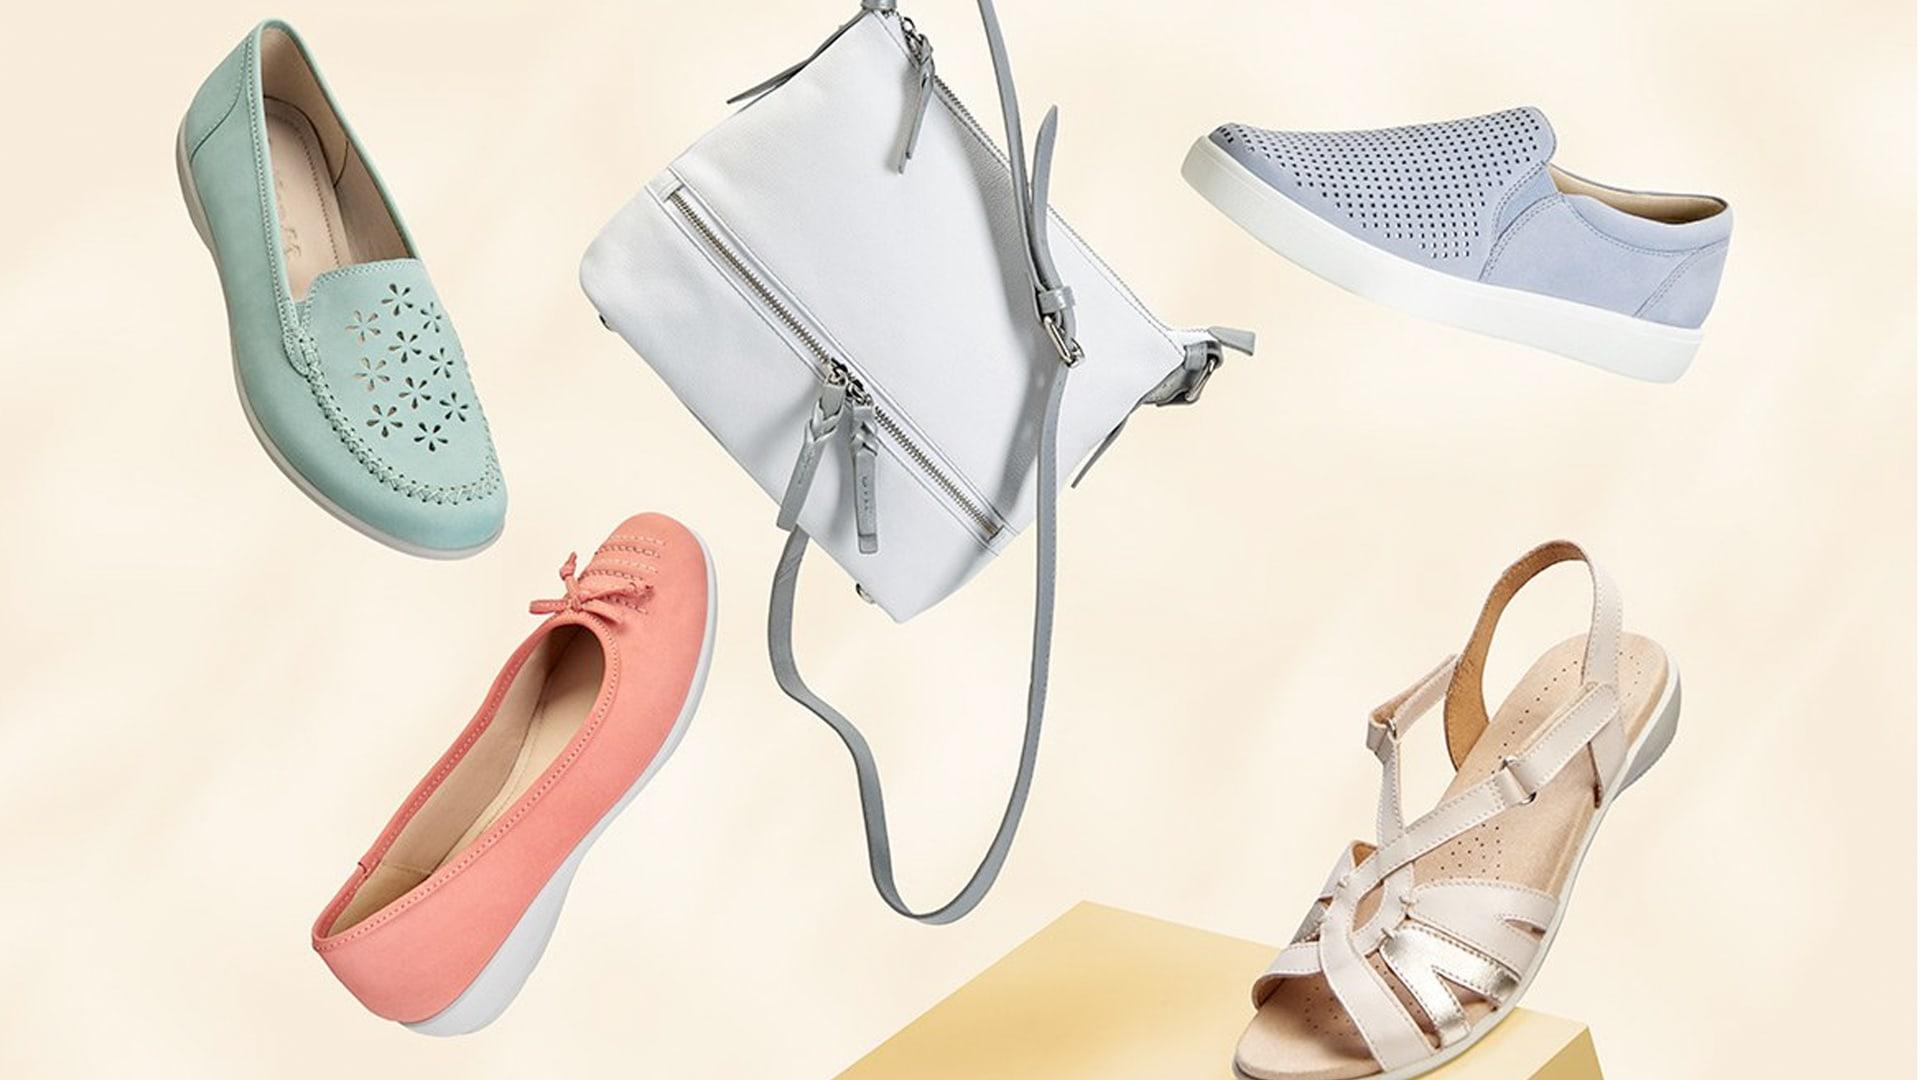 Hotter Shoes fires up new digital flagship site